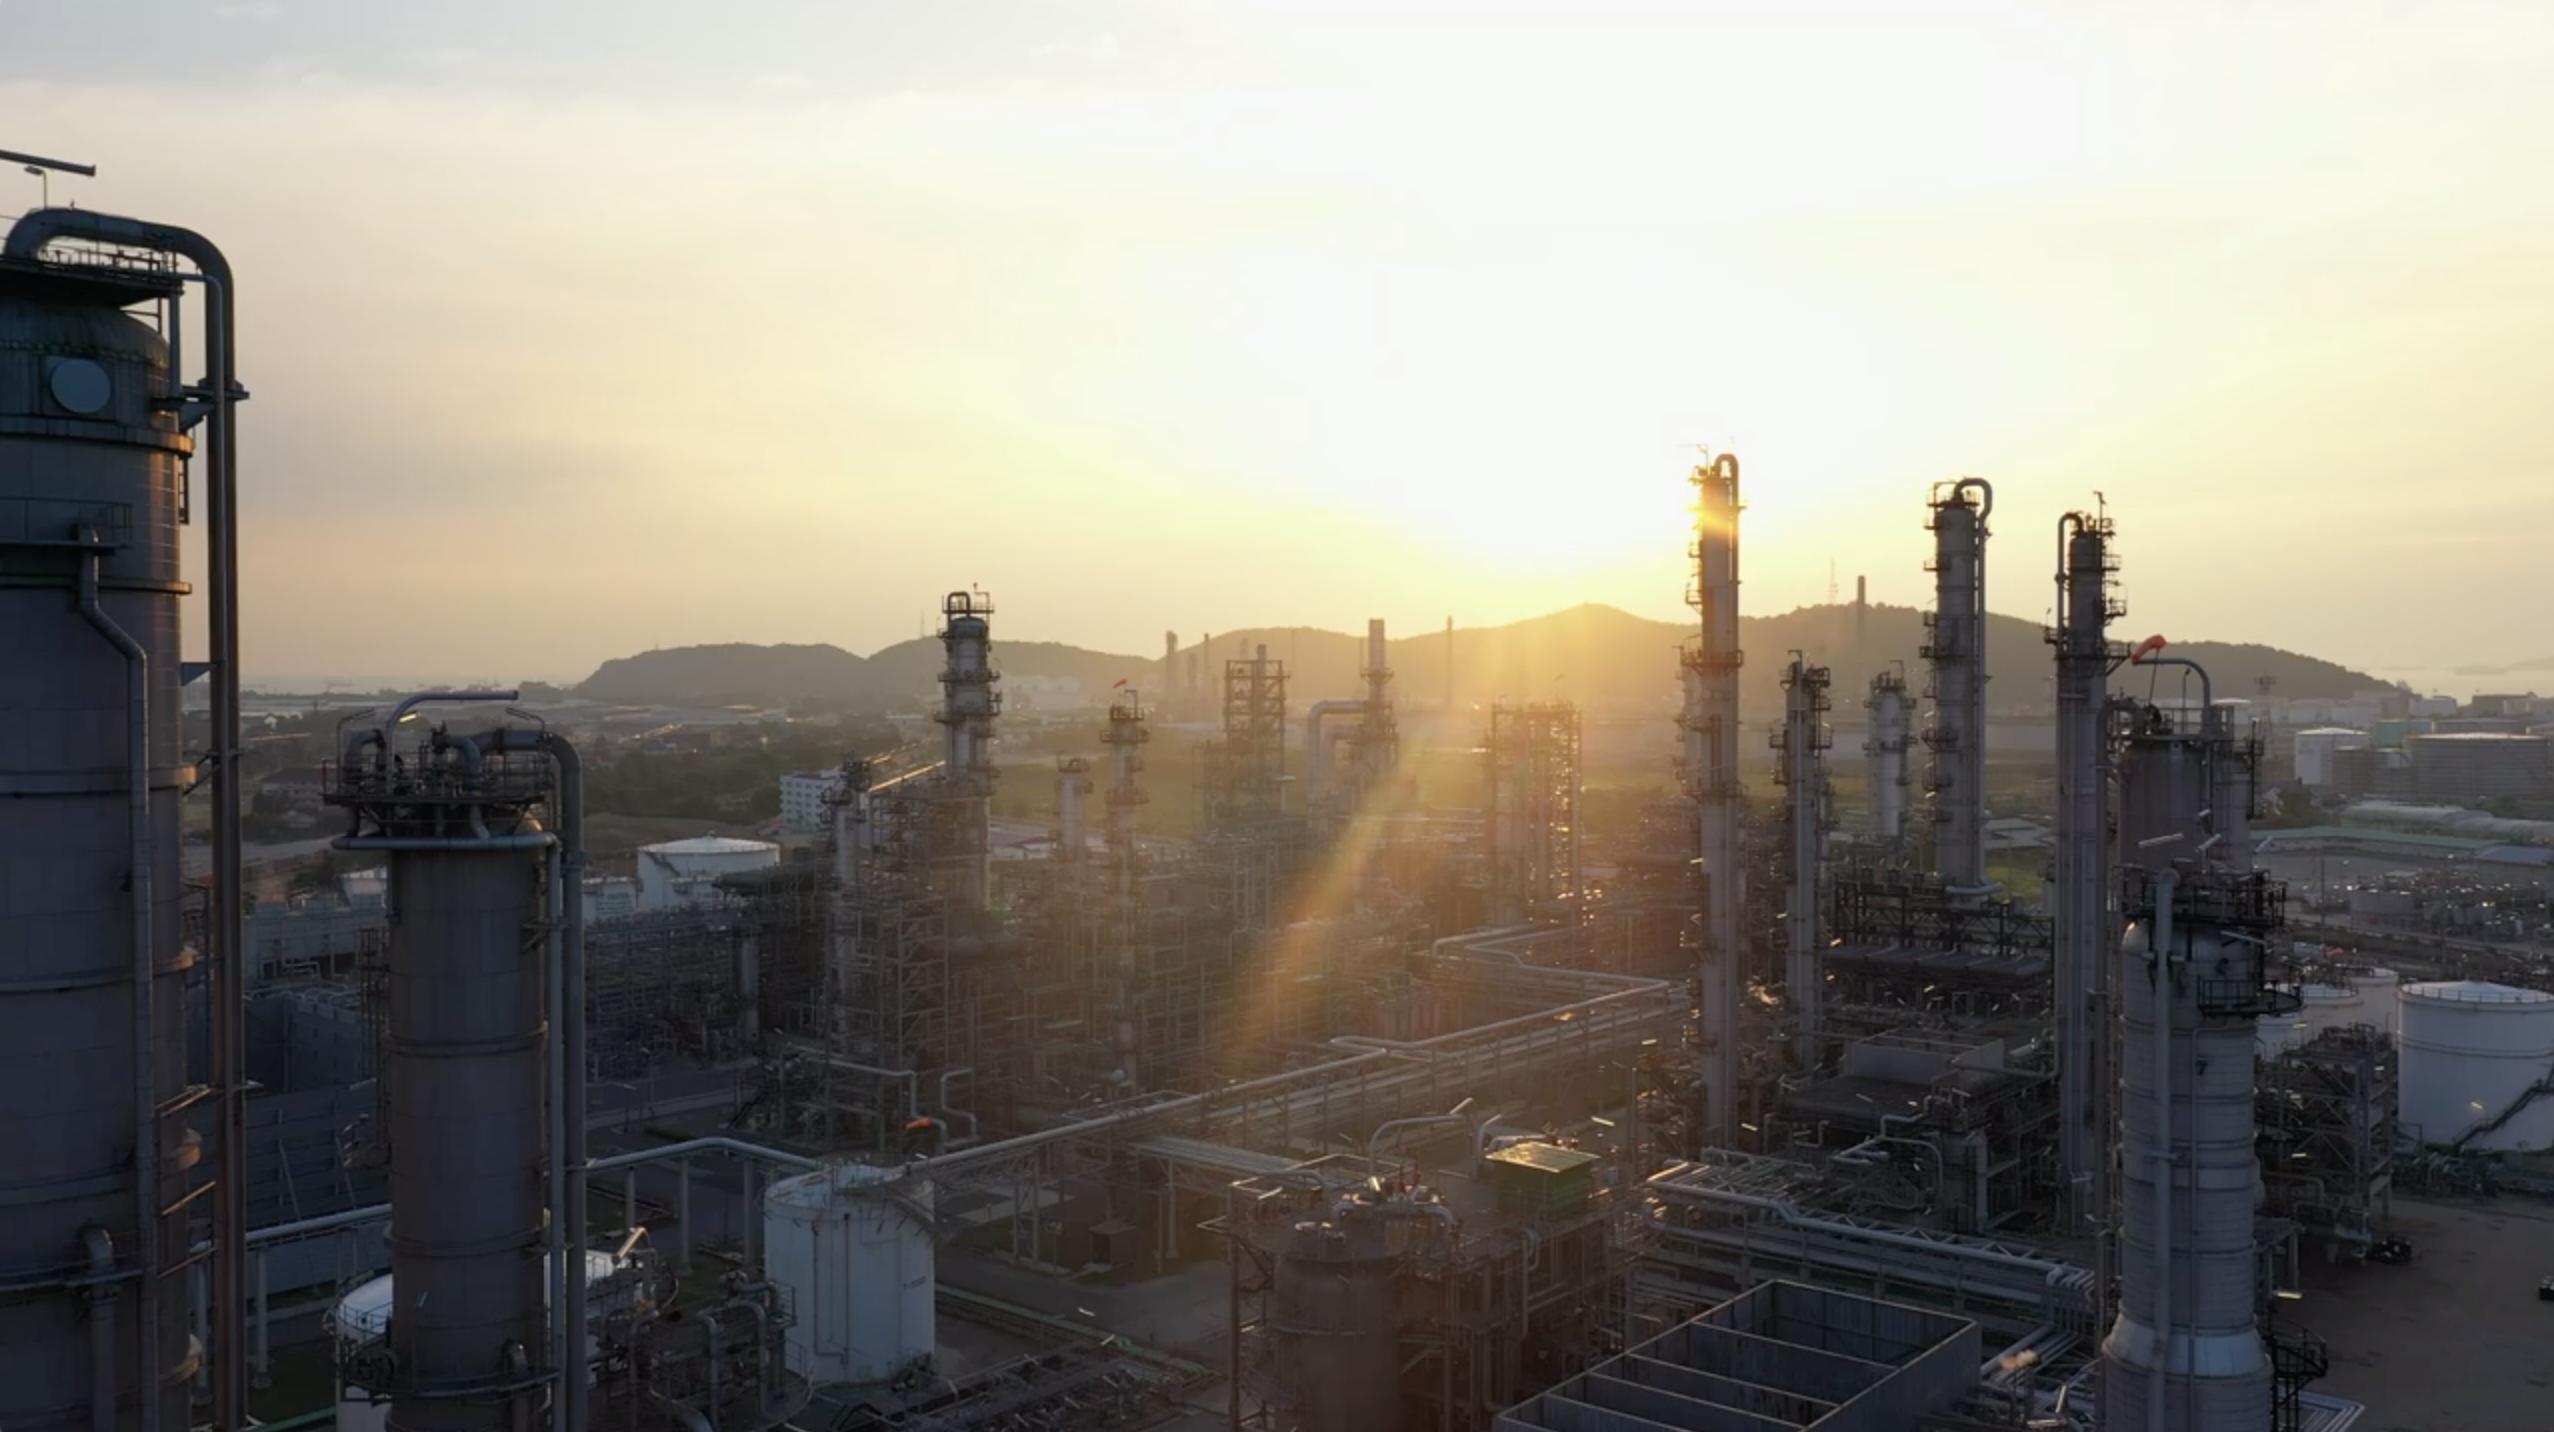 Delek's Big Spring Refinery